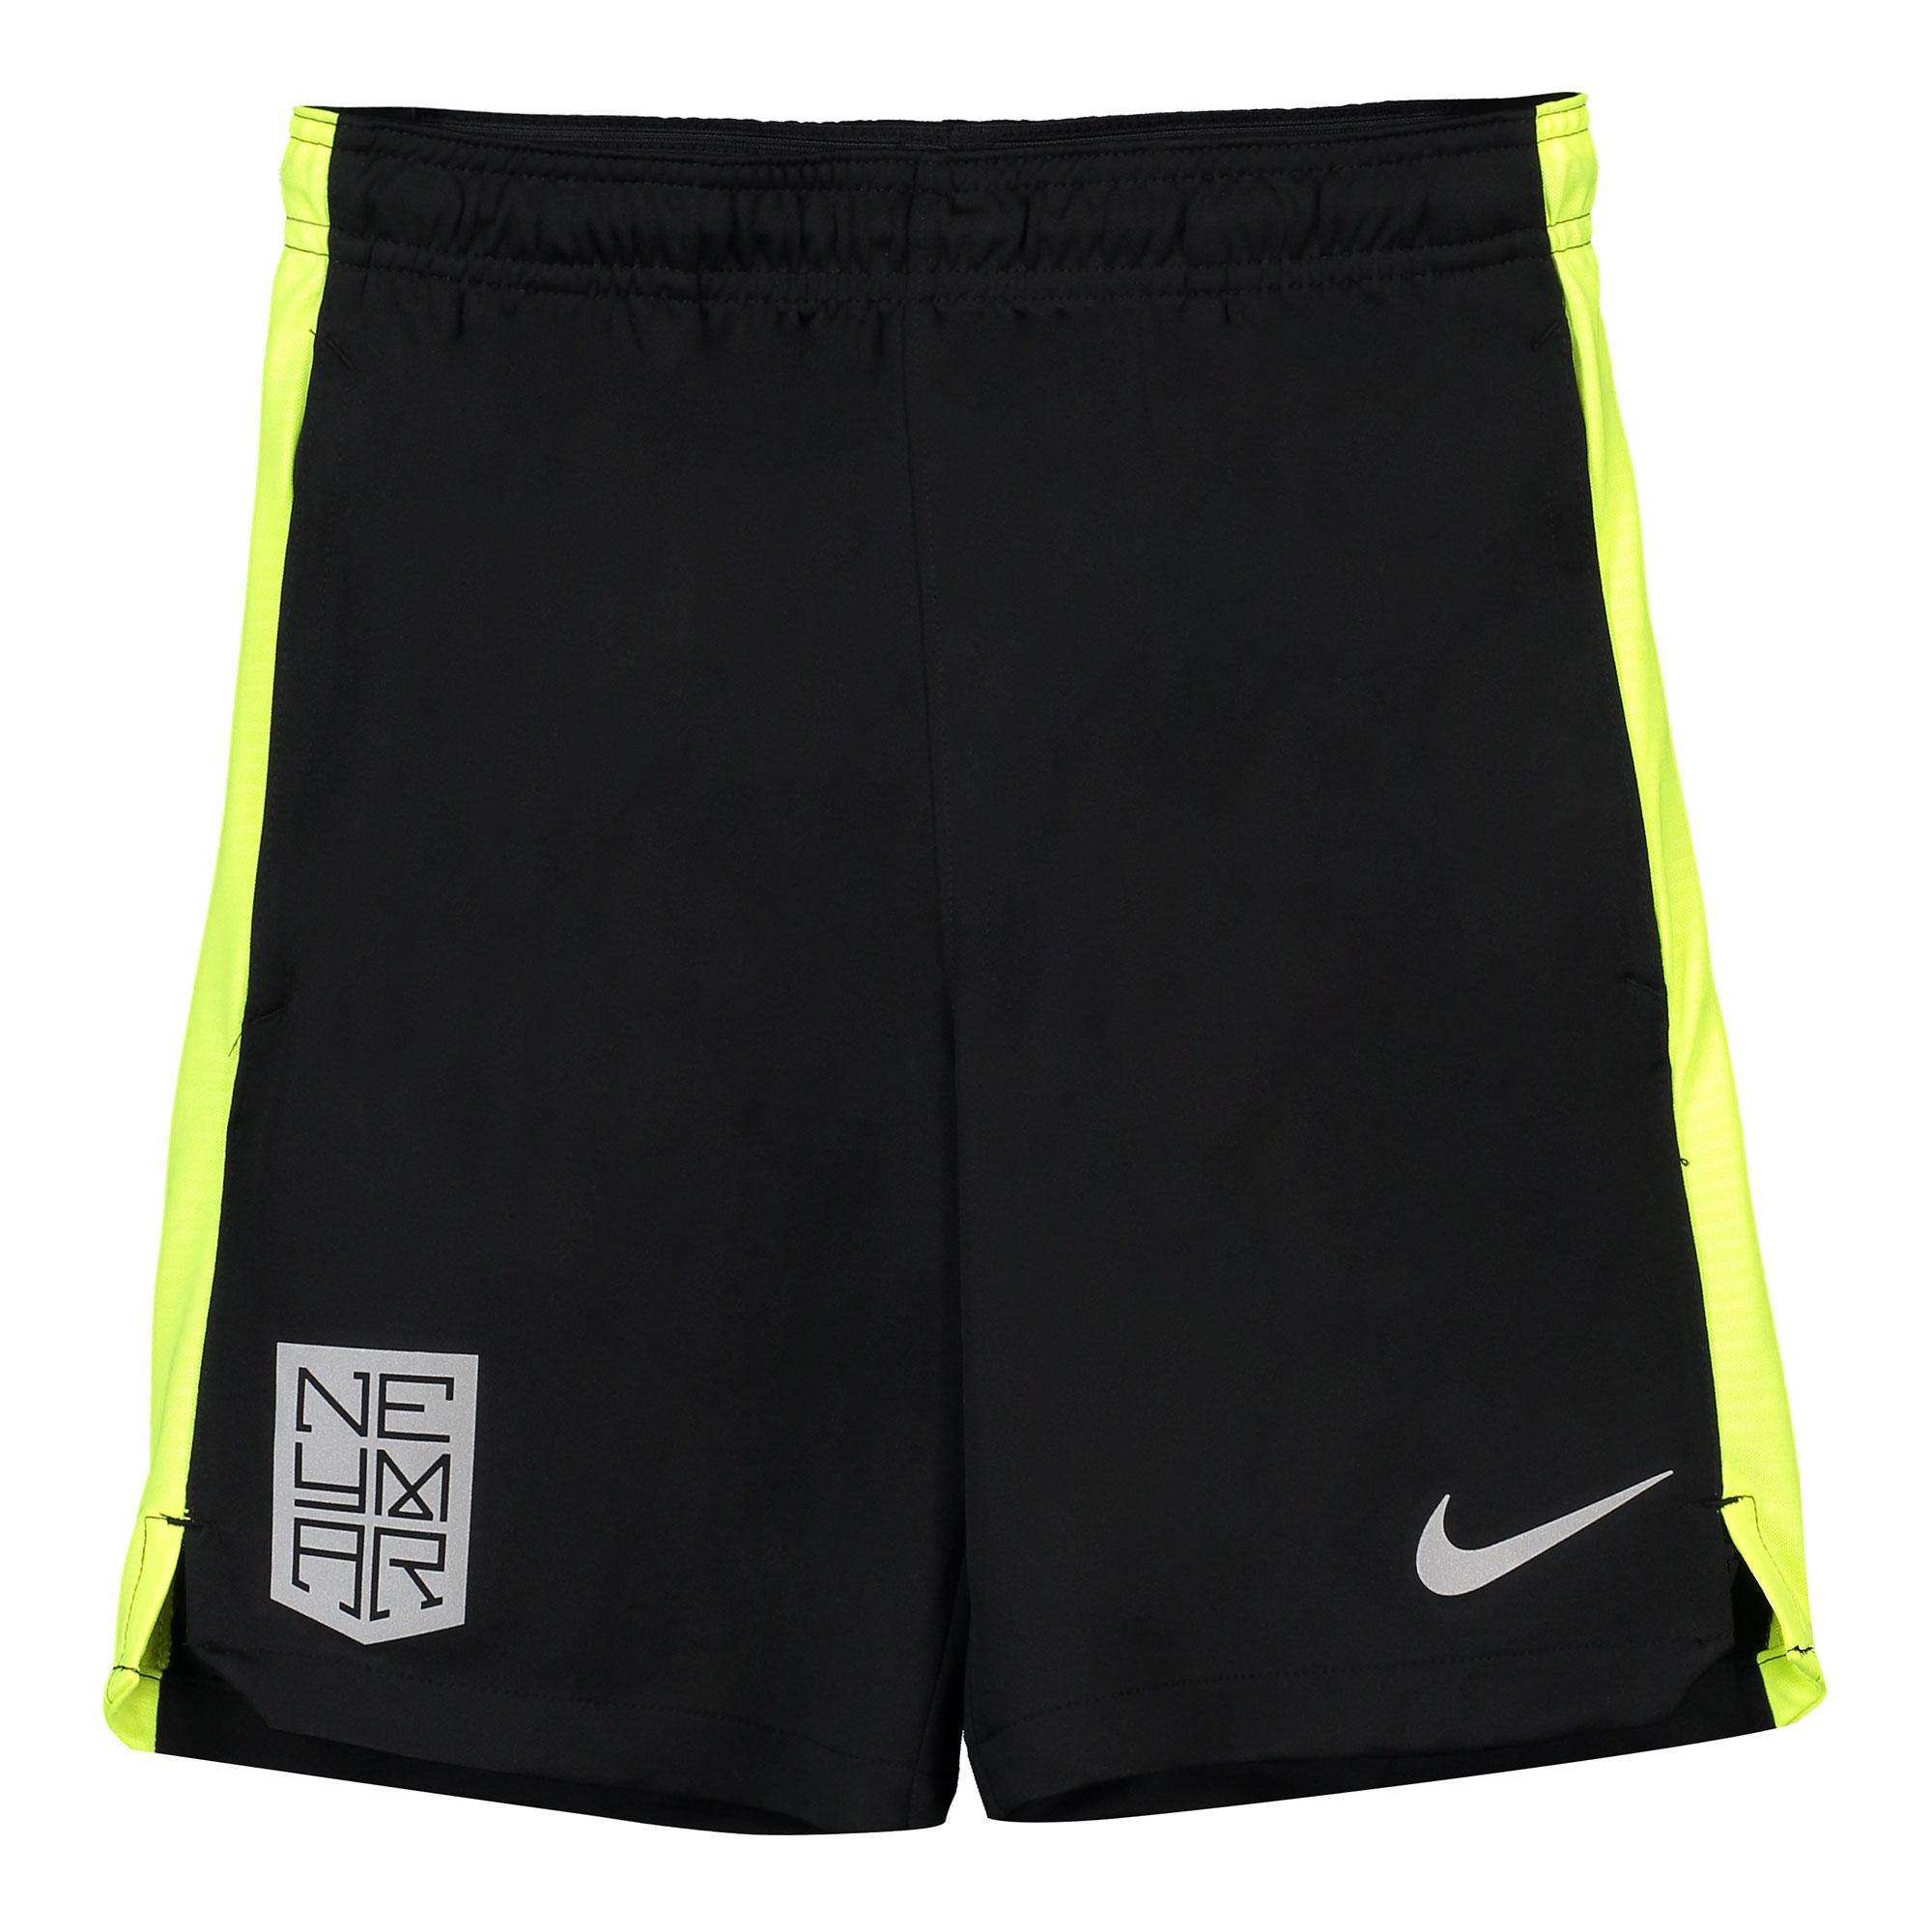 Nike Neymar Dry Squad Training Shorts - Black - Kids